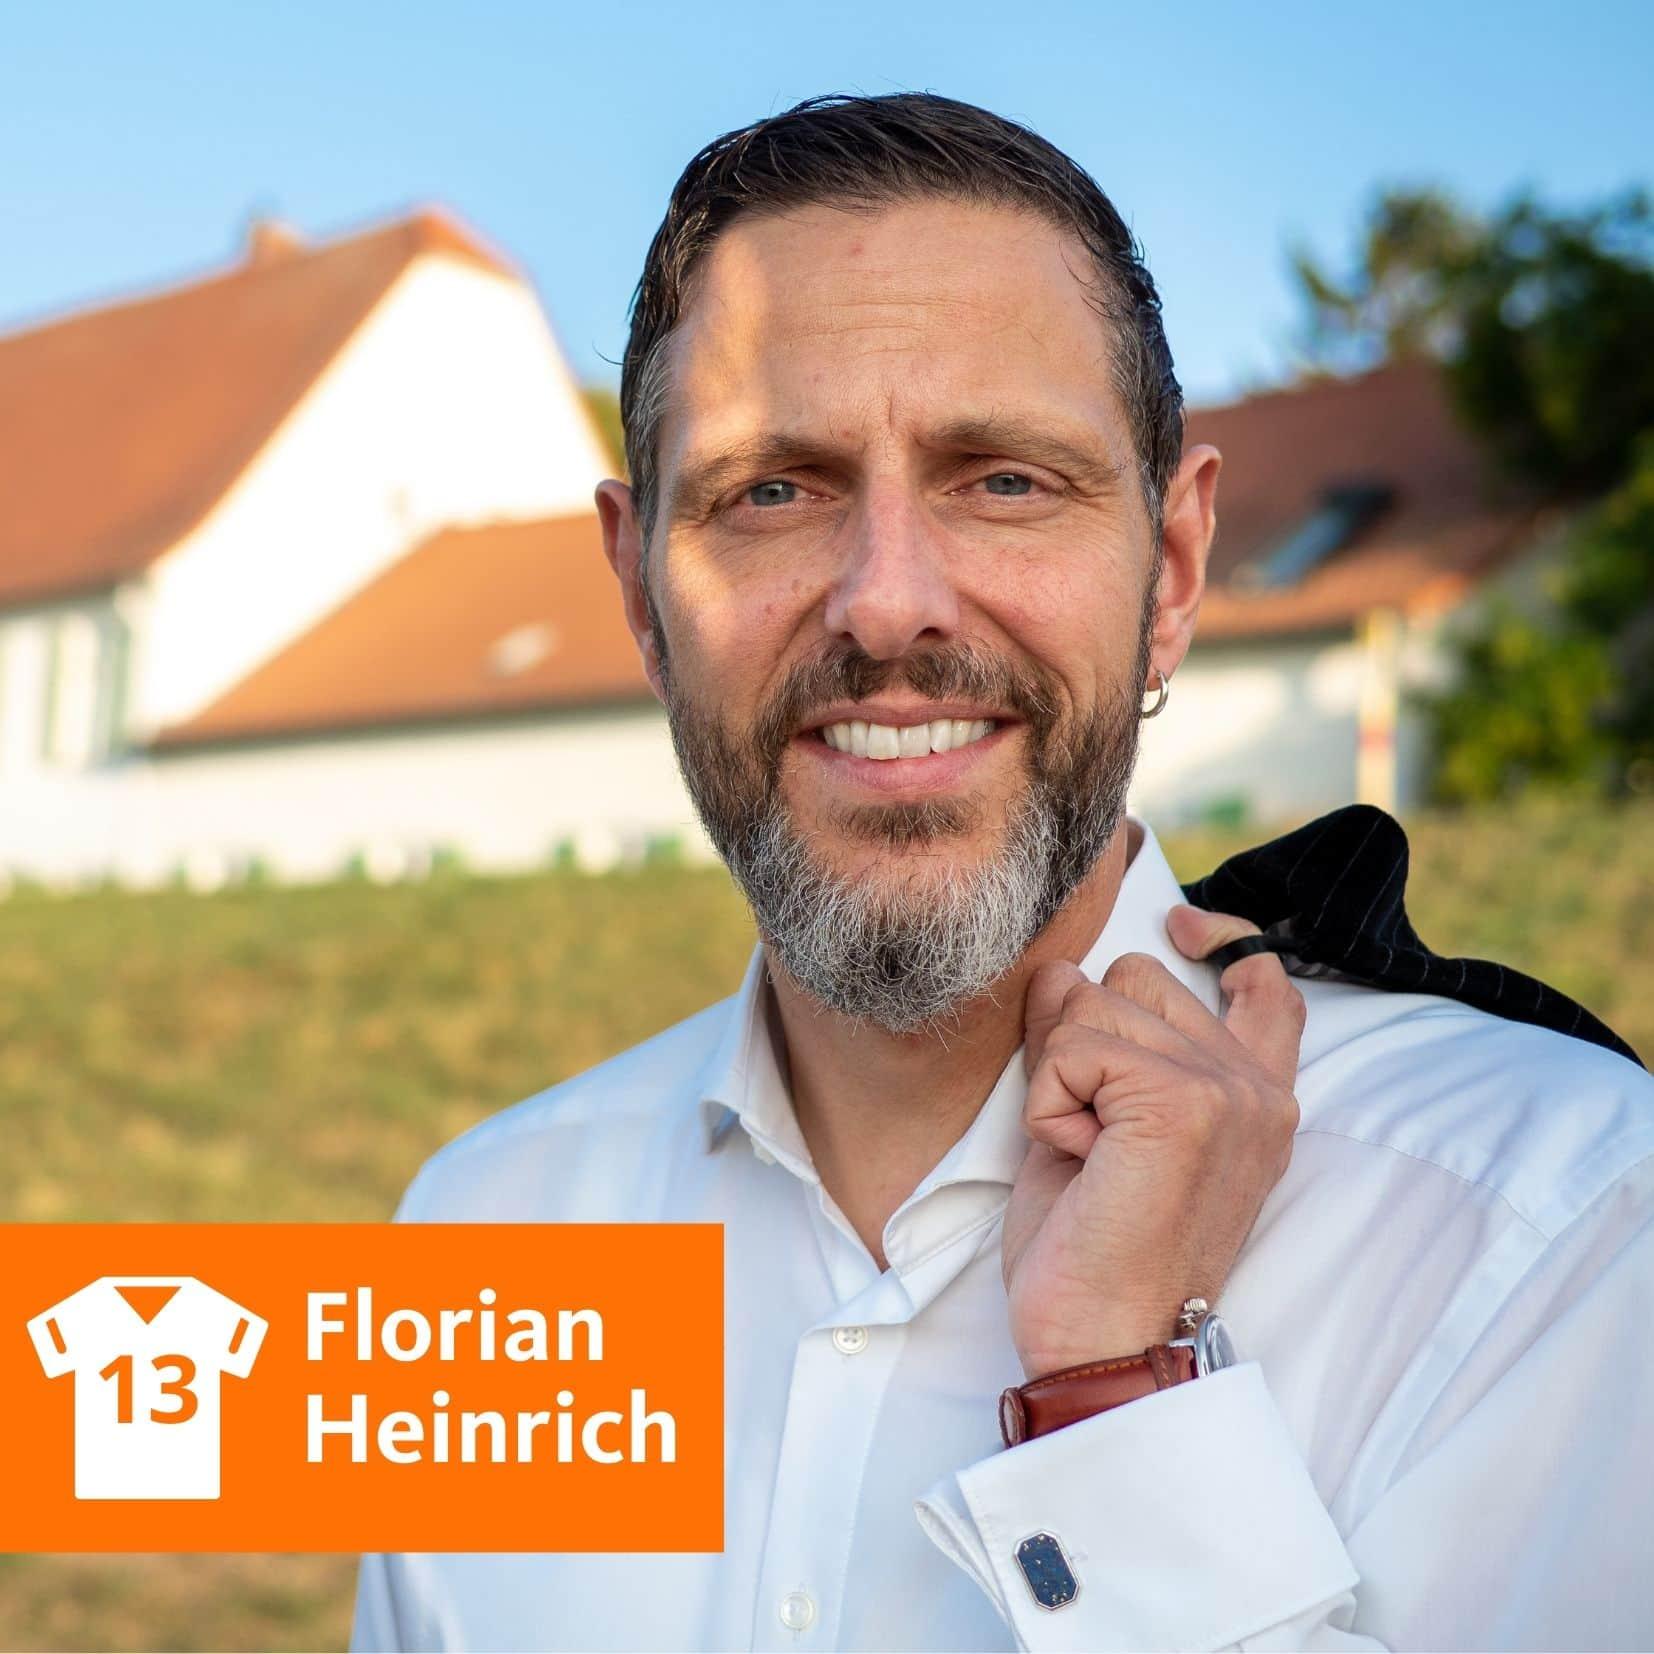 Florian Heinrich